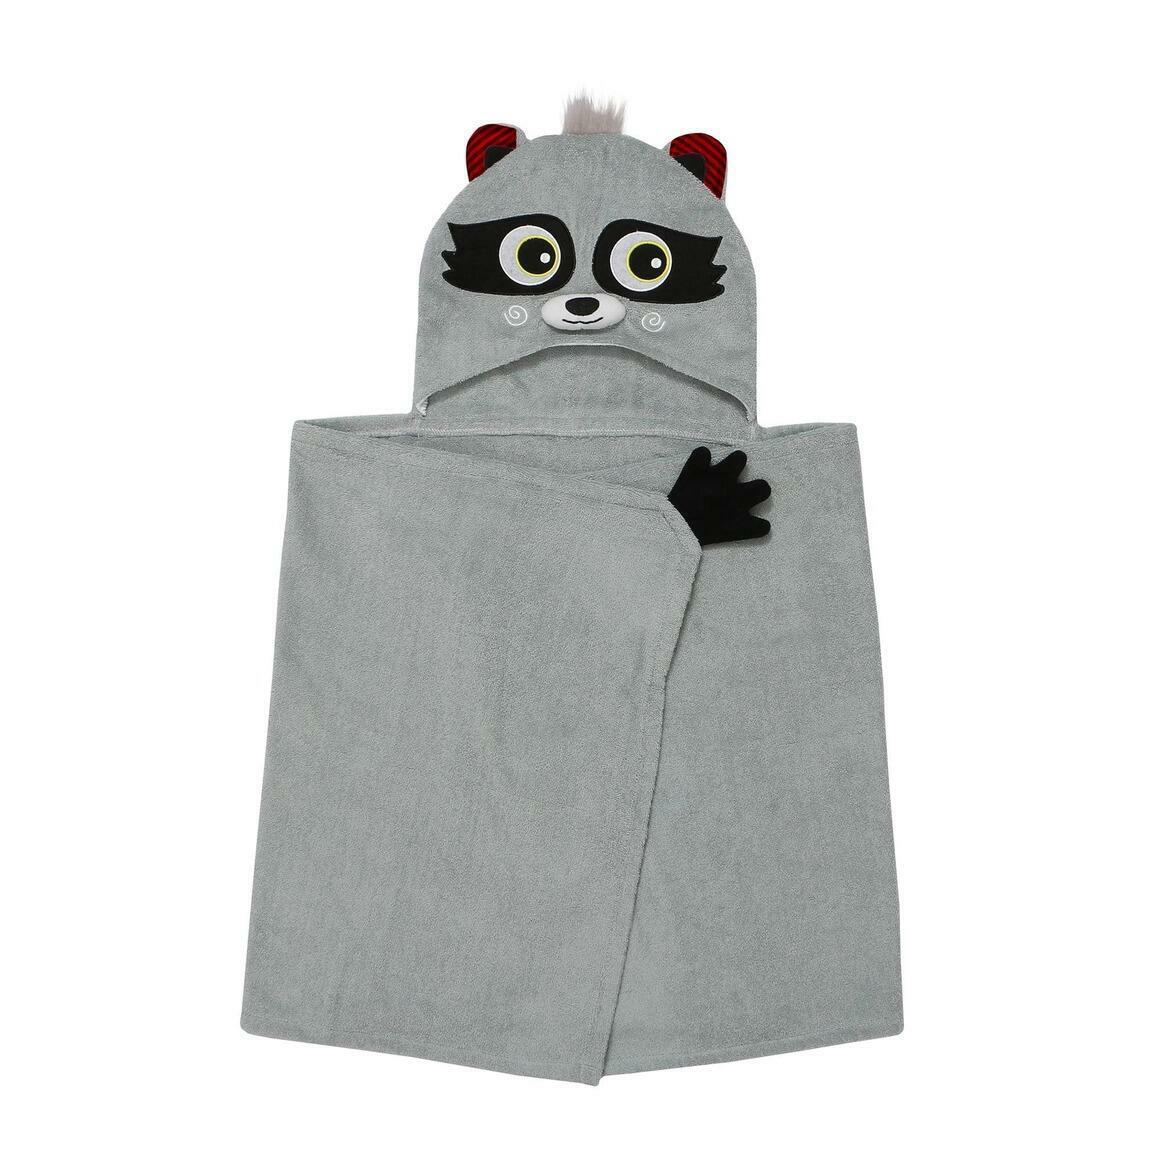 Kids Plus Terry Hooded Bath Towel Racoon 2Y+ | Trada Marketplace